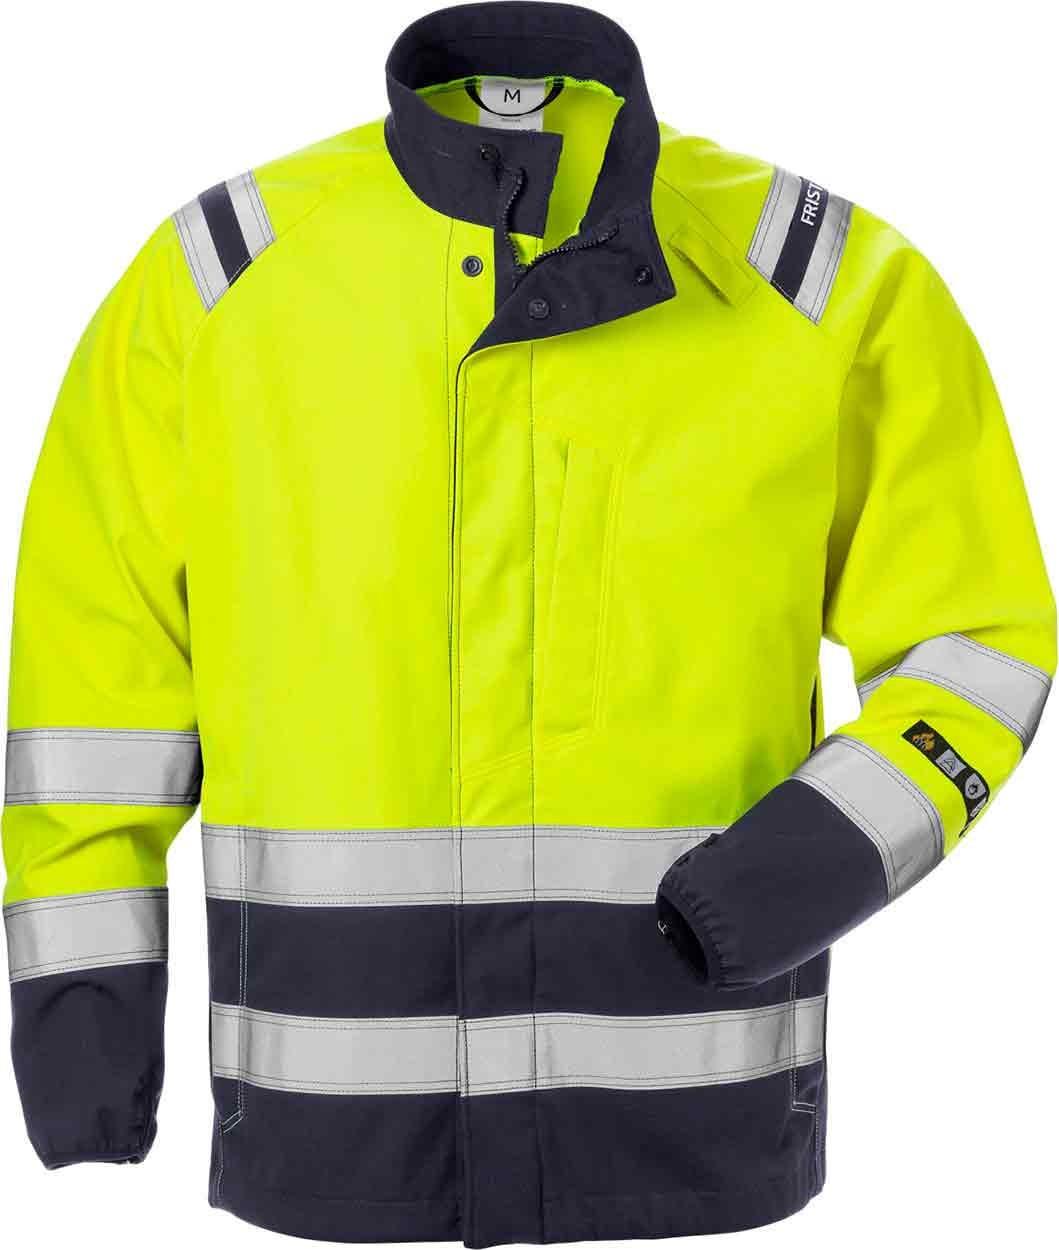 6b15989ebfa1 Fristads Flamestat softshell jacket cl 3 4016 FSS - Flame Retardant ...